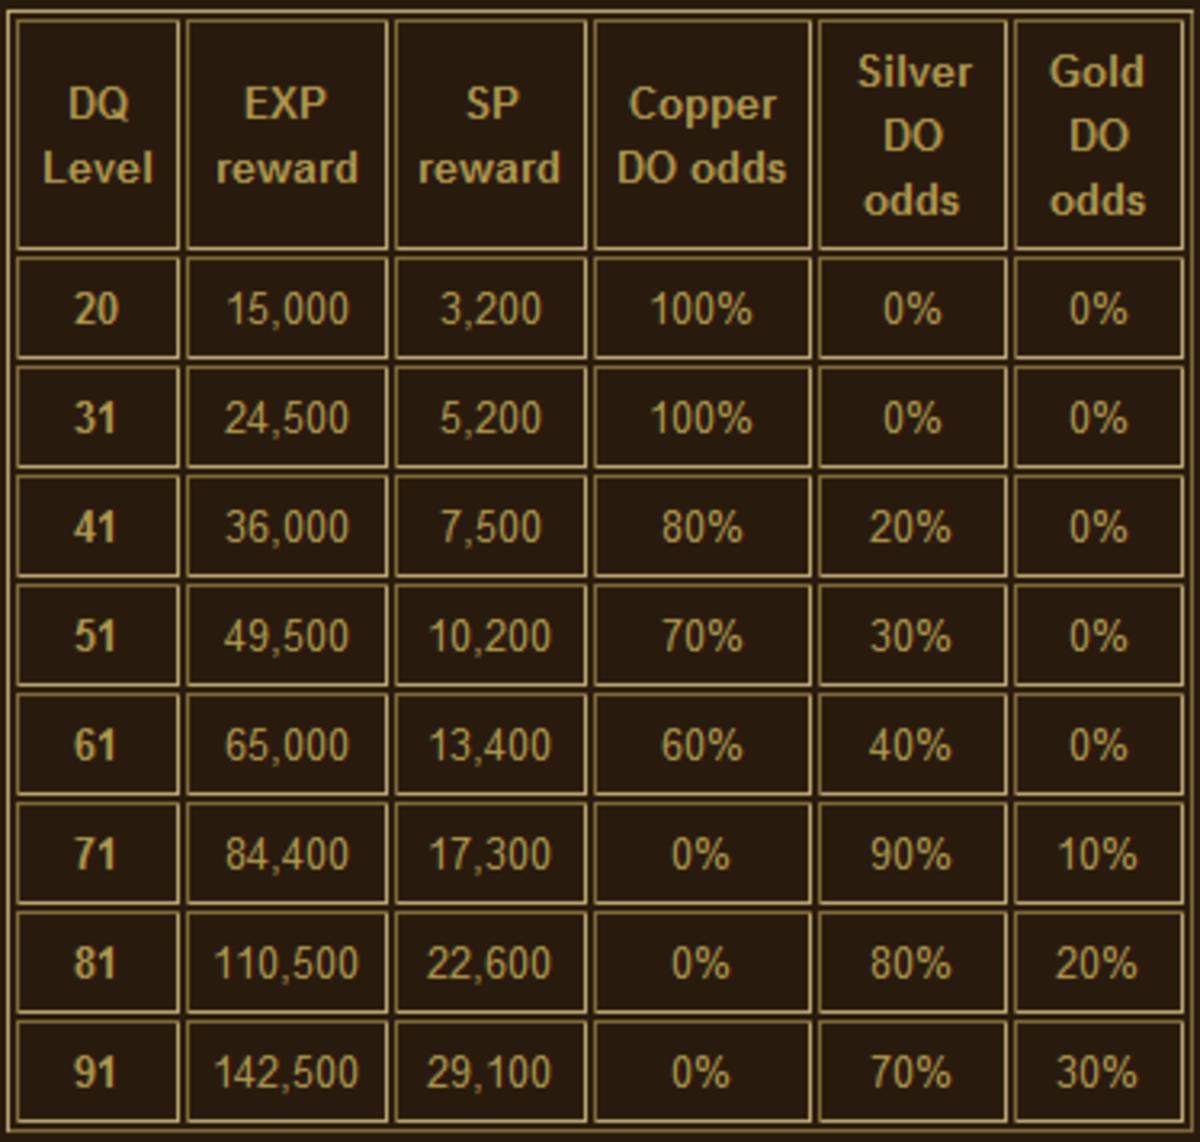 Dragon Quest reward graph